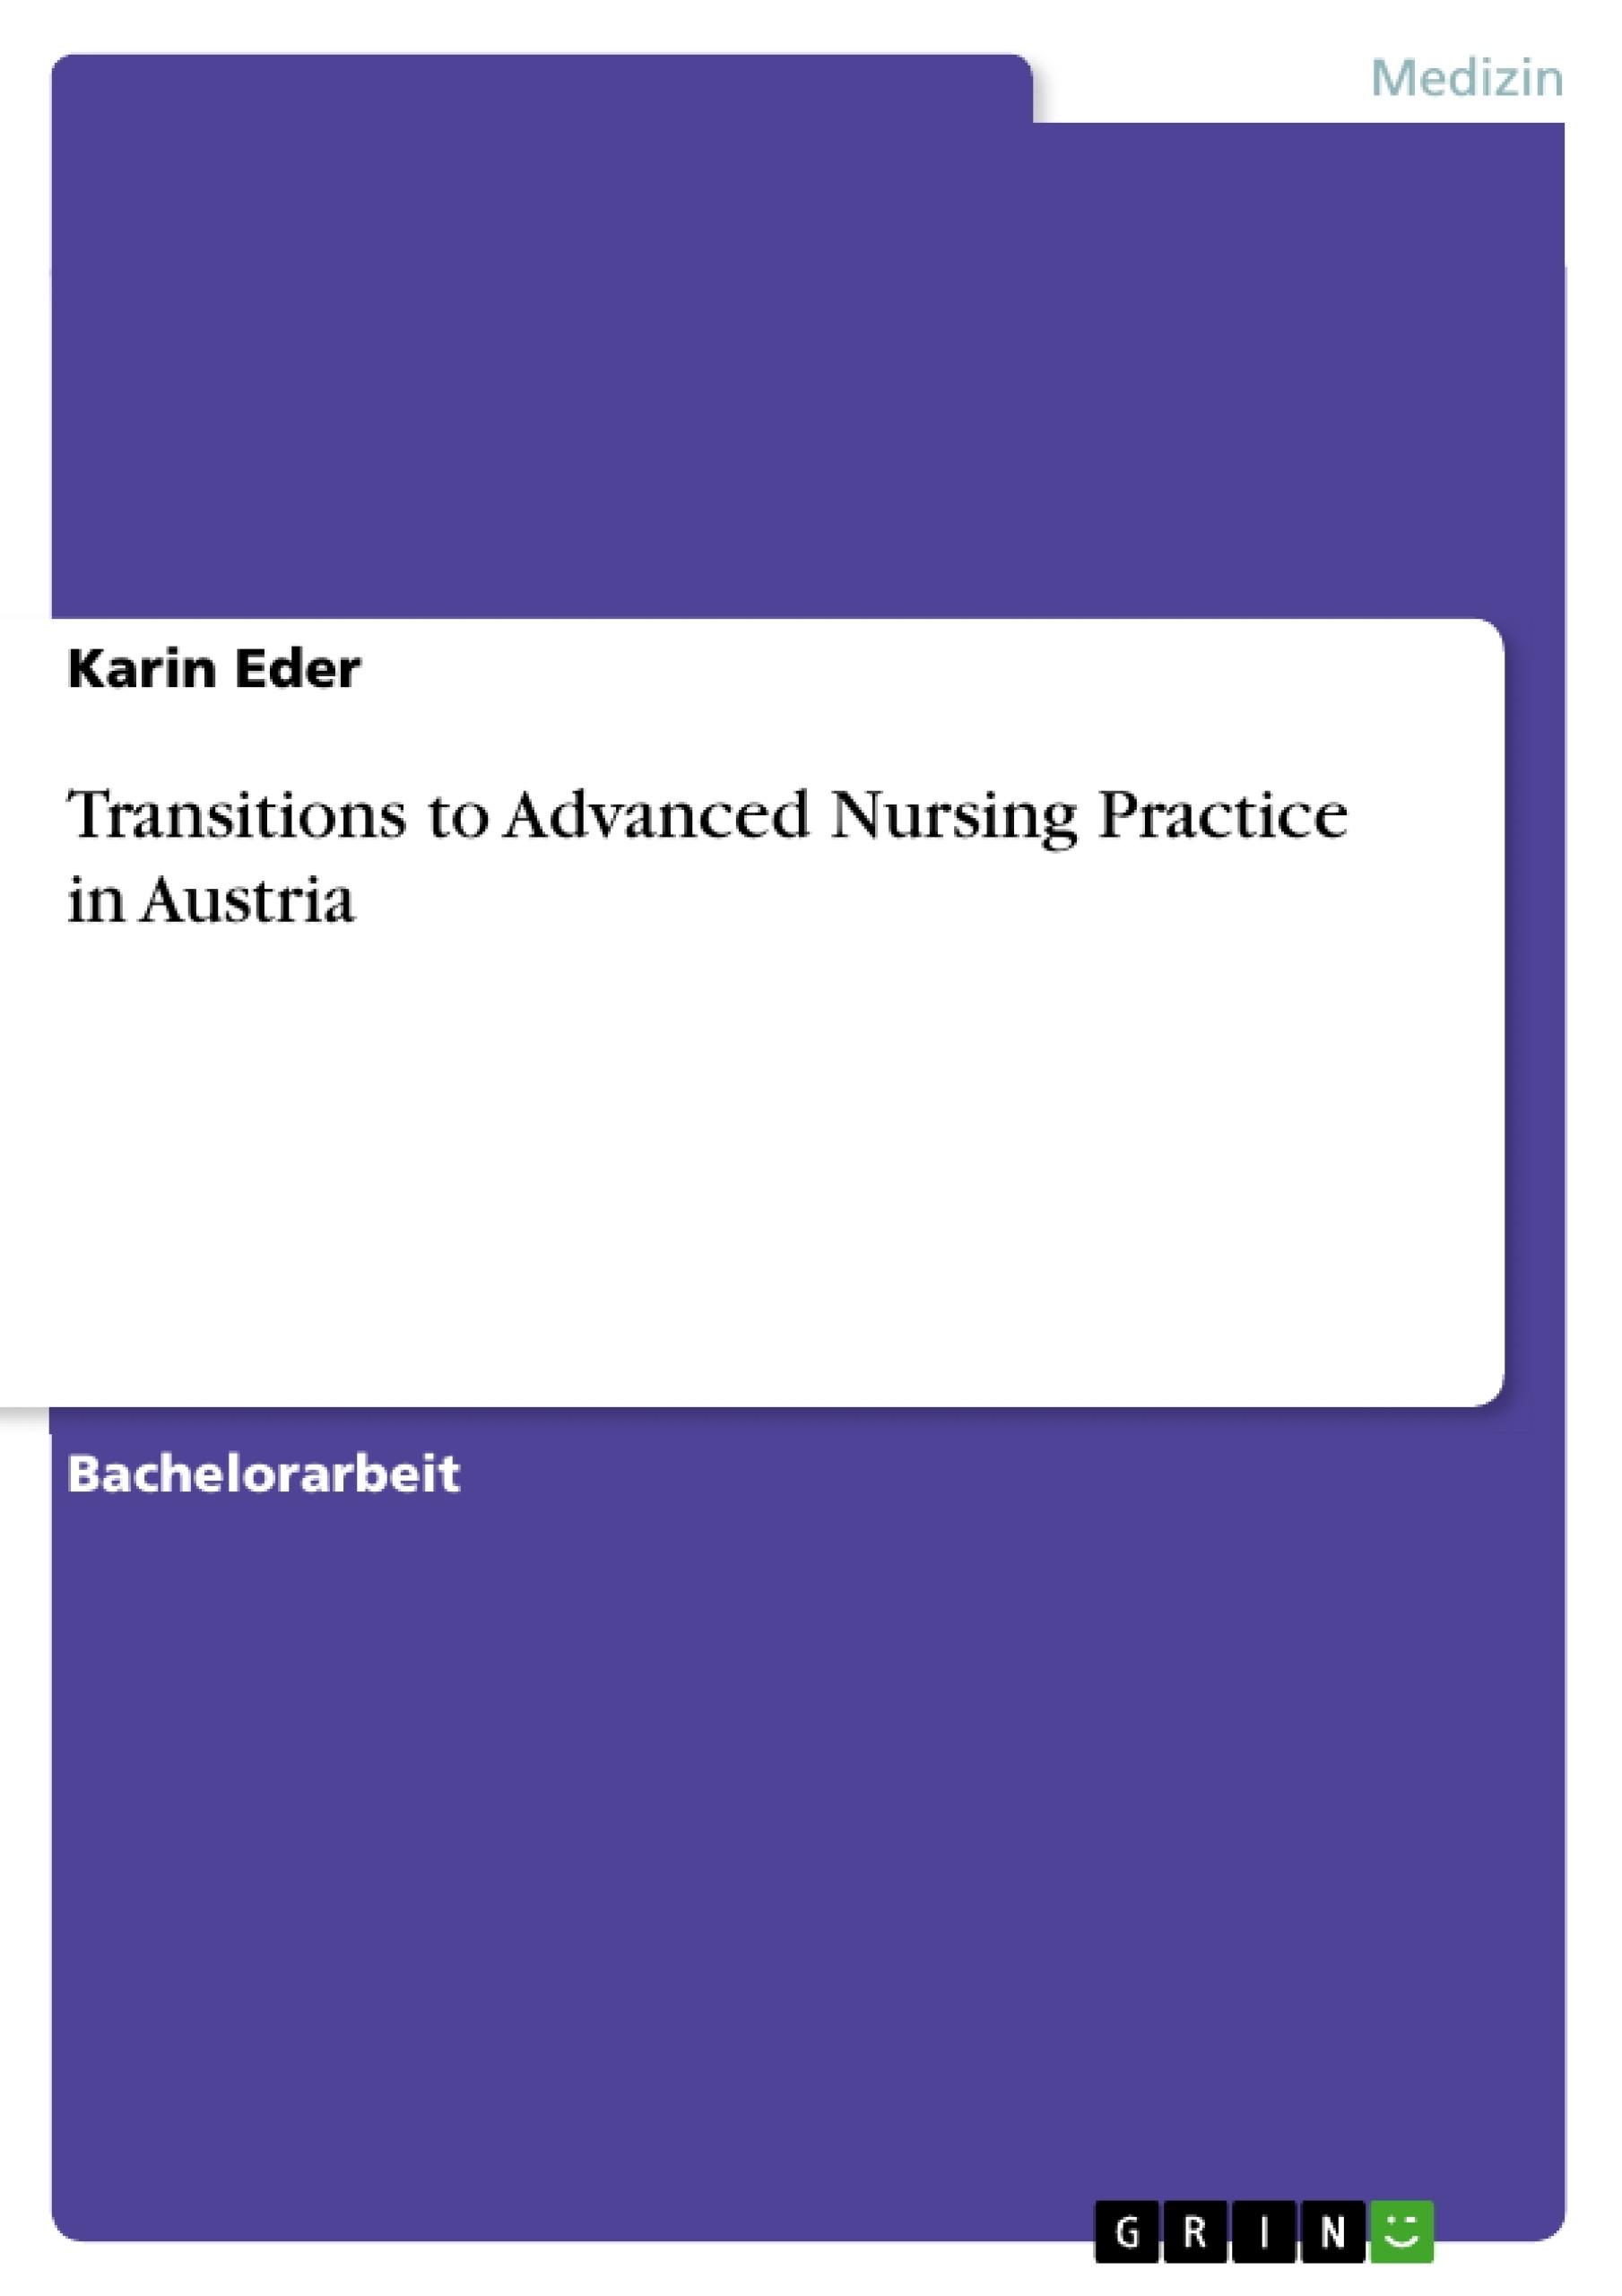 Titel: Transitions to Advanced Nursing Practice in Austria